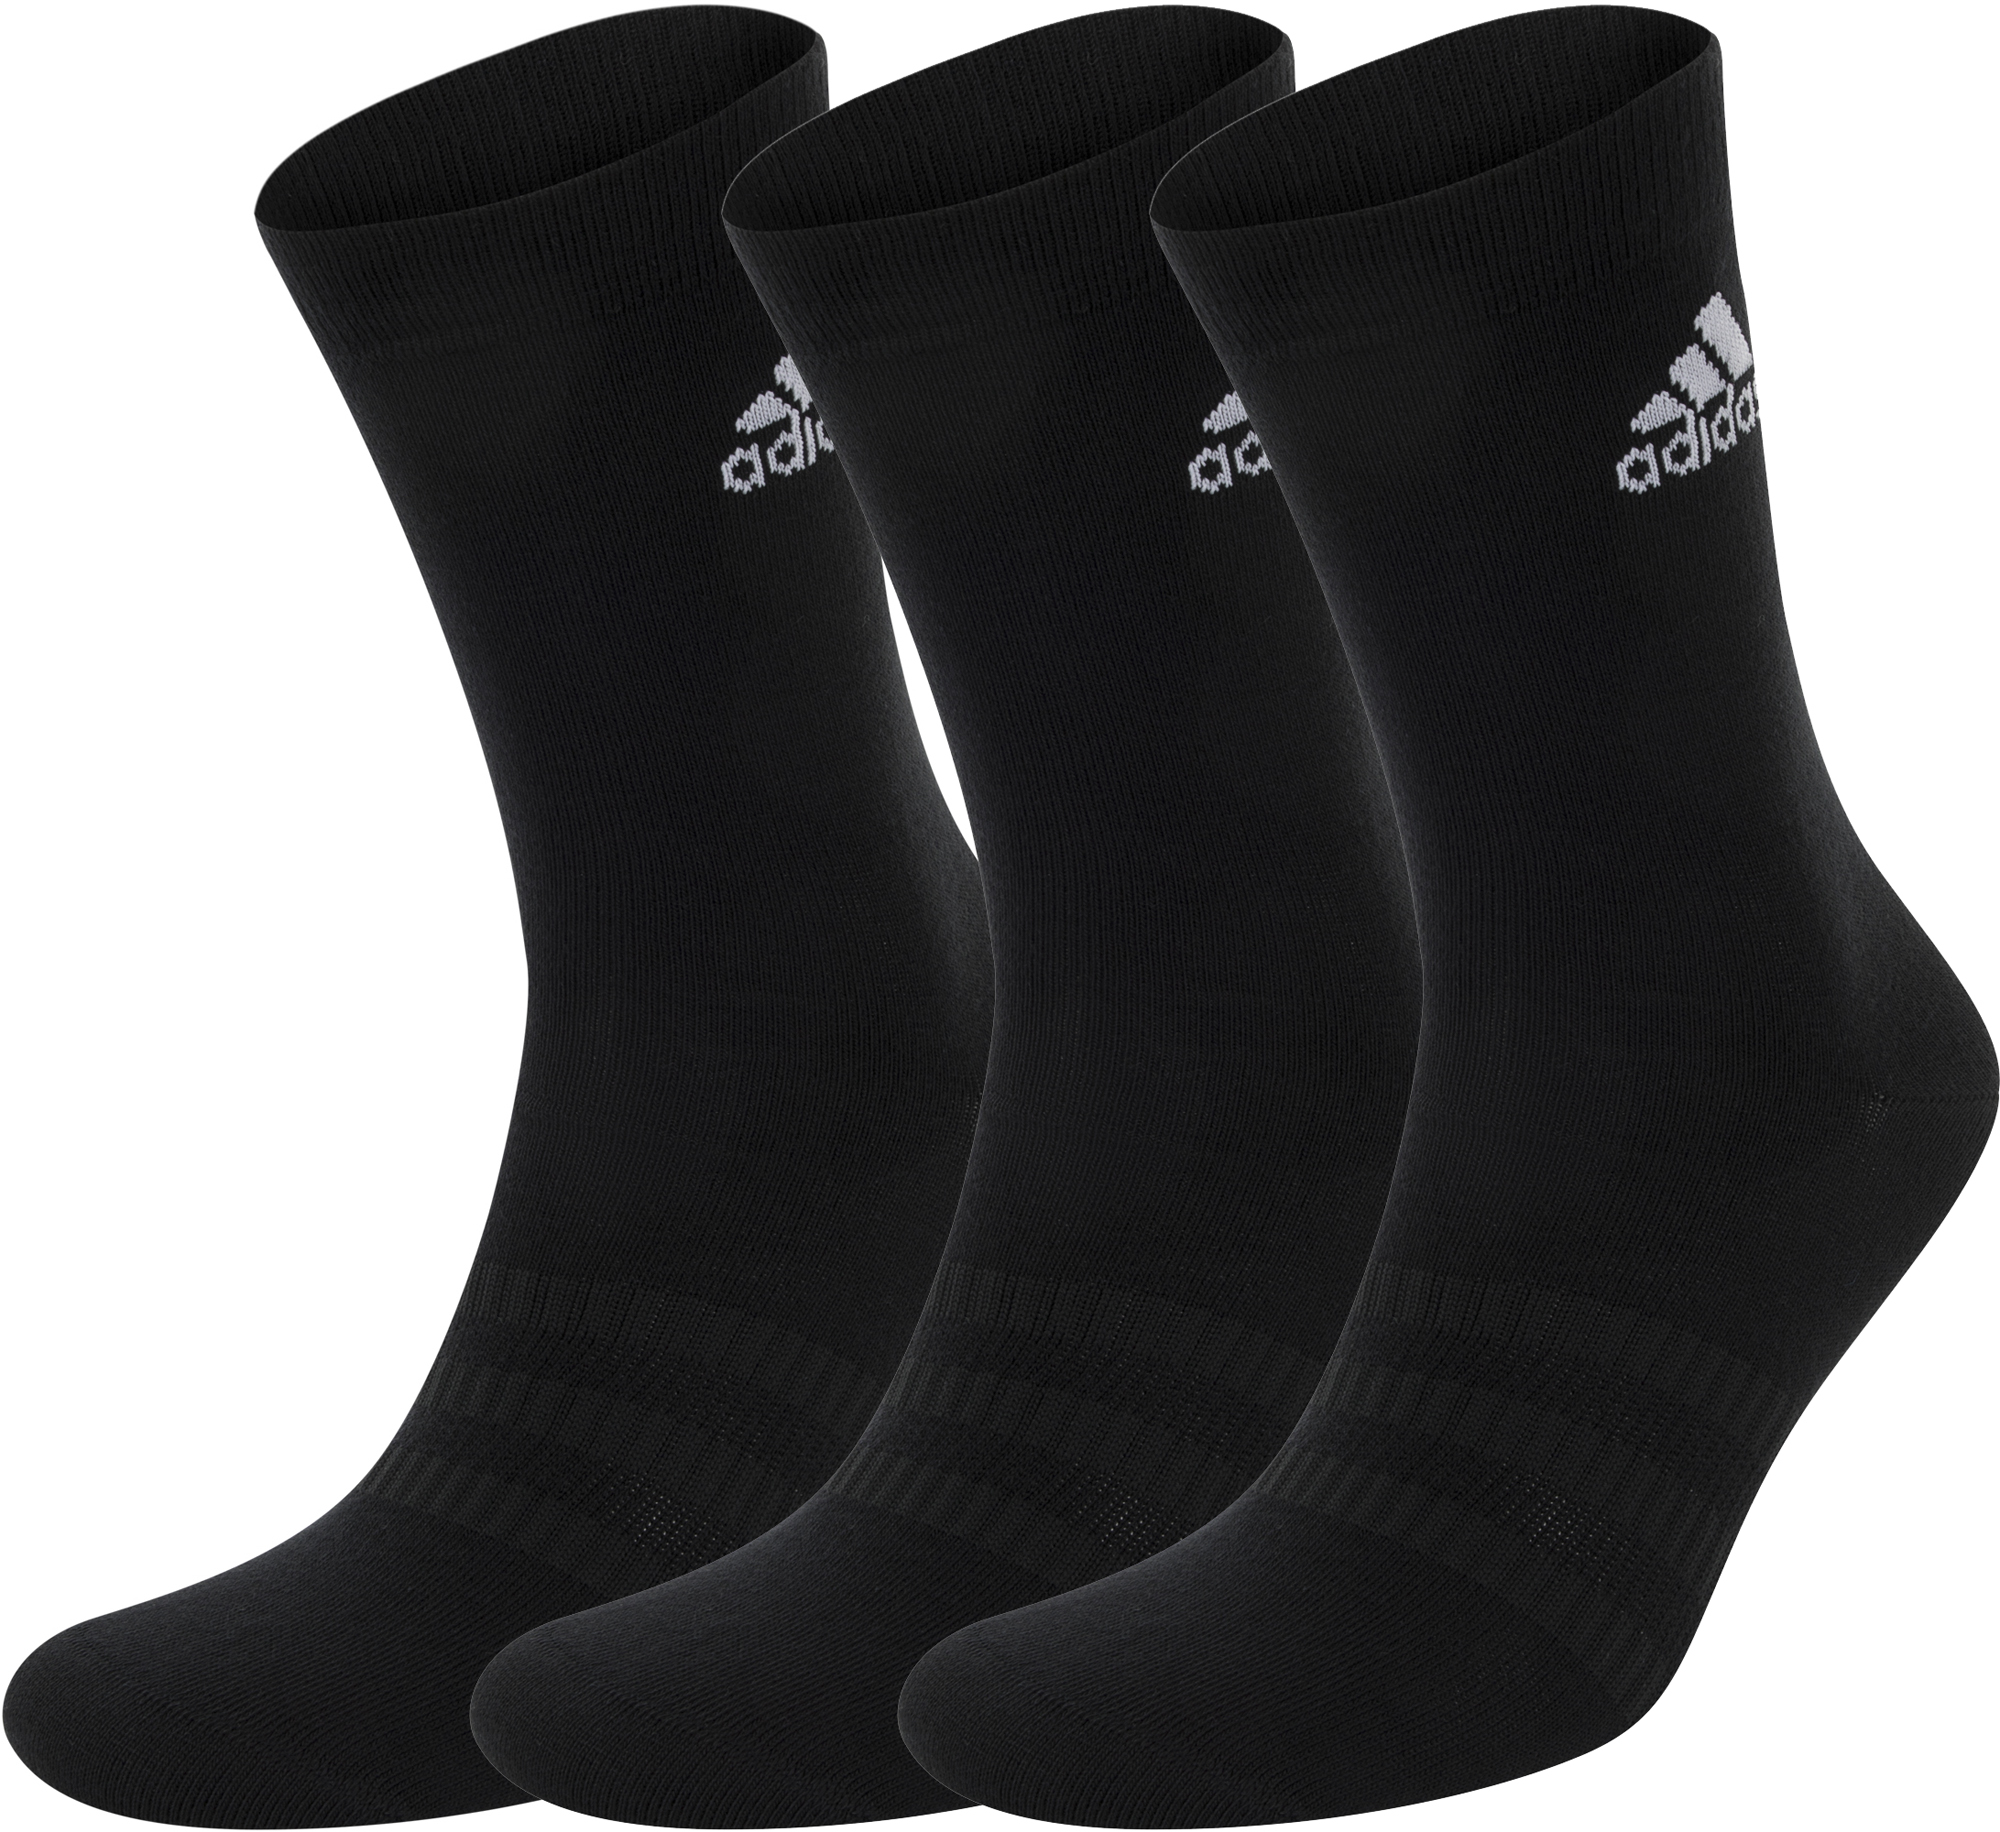 Adidas Носки Adidas Crew, 3 пары, размер 46-48 цена 2017